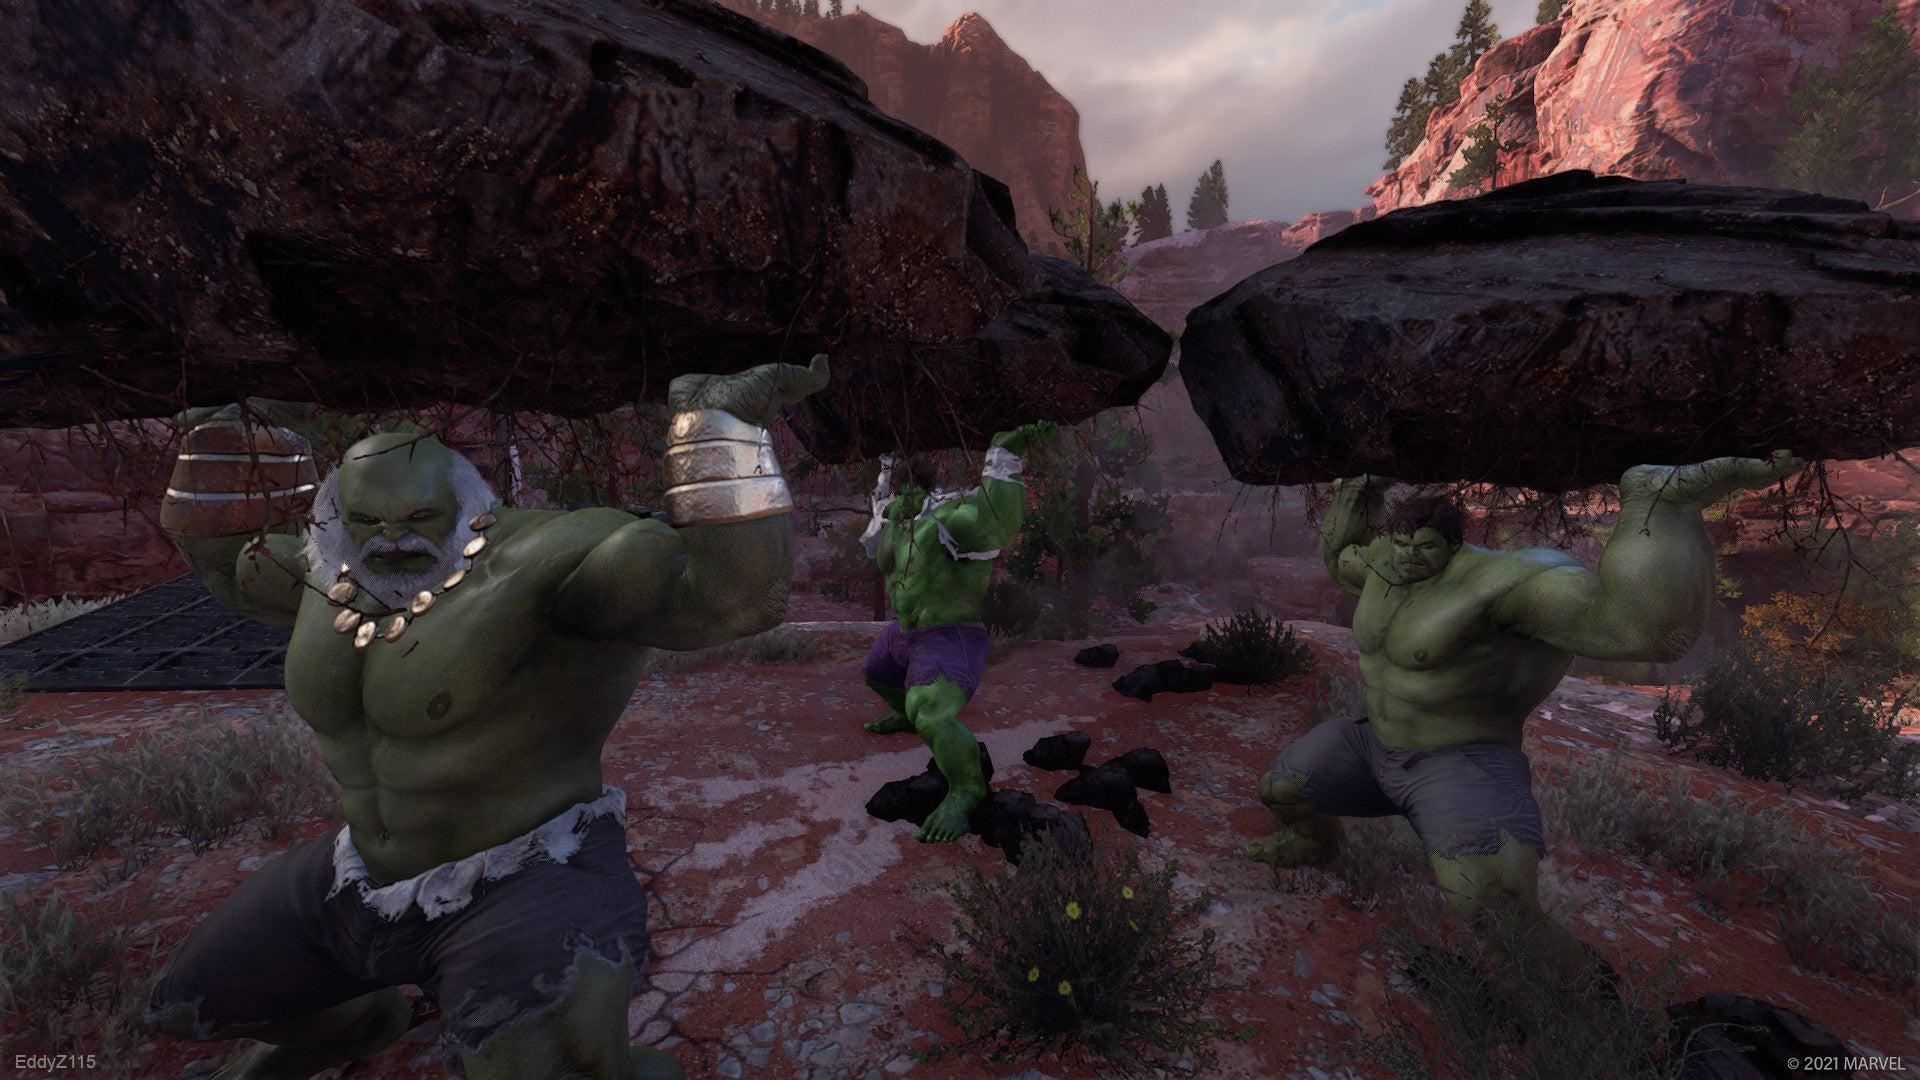 Three Hulks lift giant boulders above their heads in the Utah Badlands.